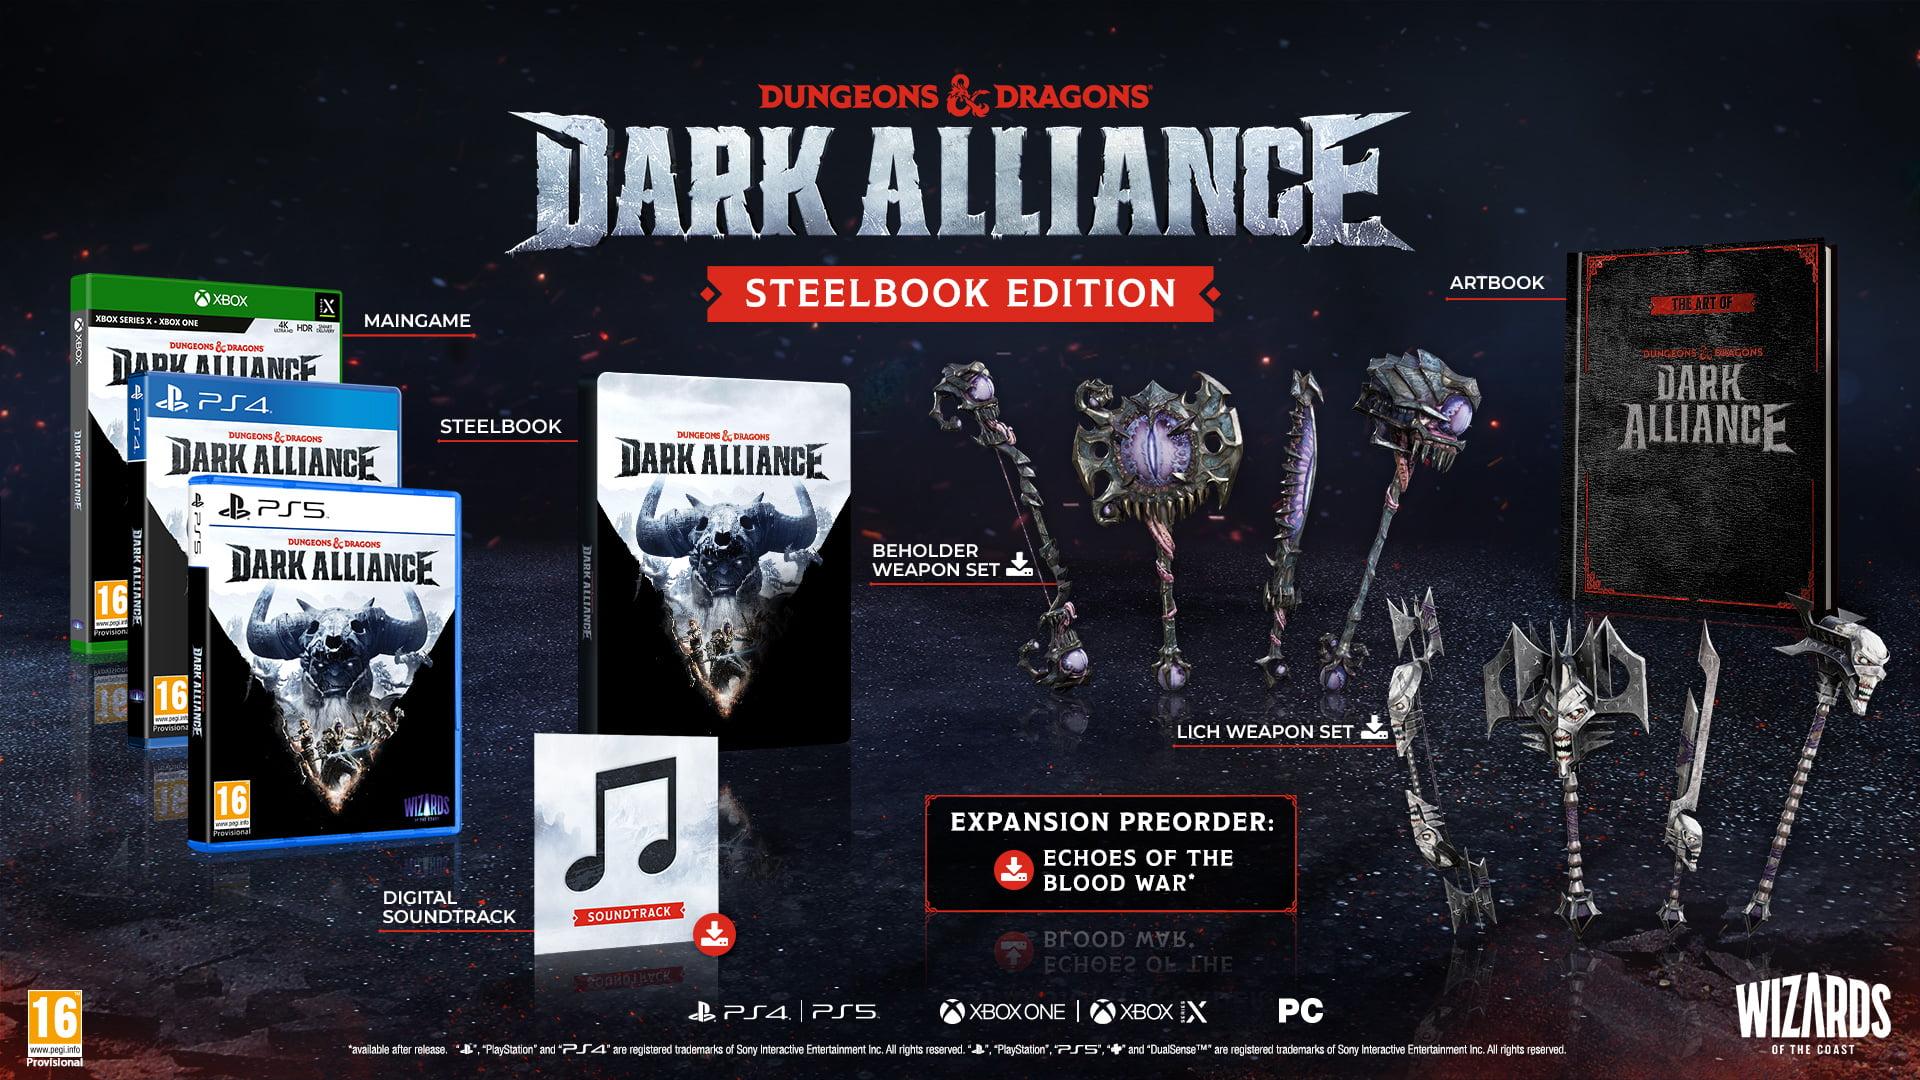 Dungeons and Dragons: Dark Alliance - Steelbook Edition (PS5)